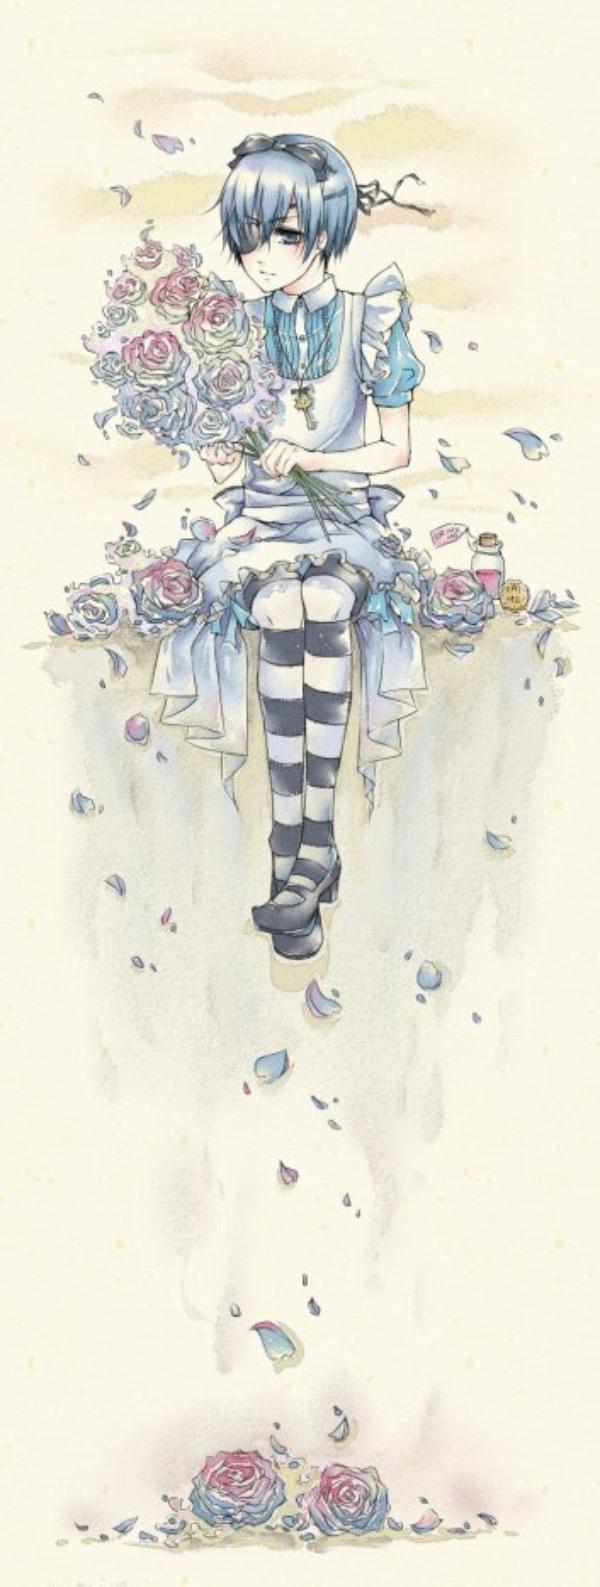 ♥ Ciel in Wonderland ♥